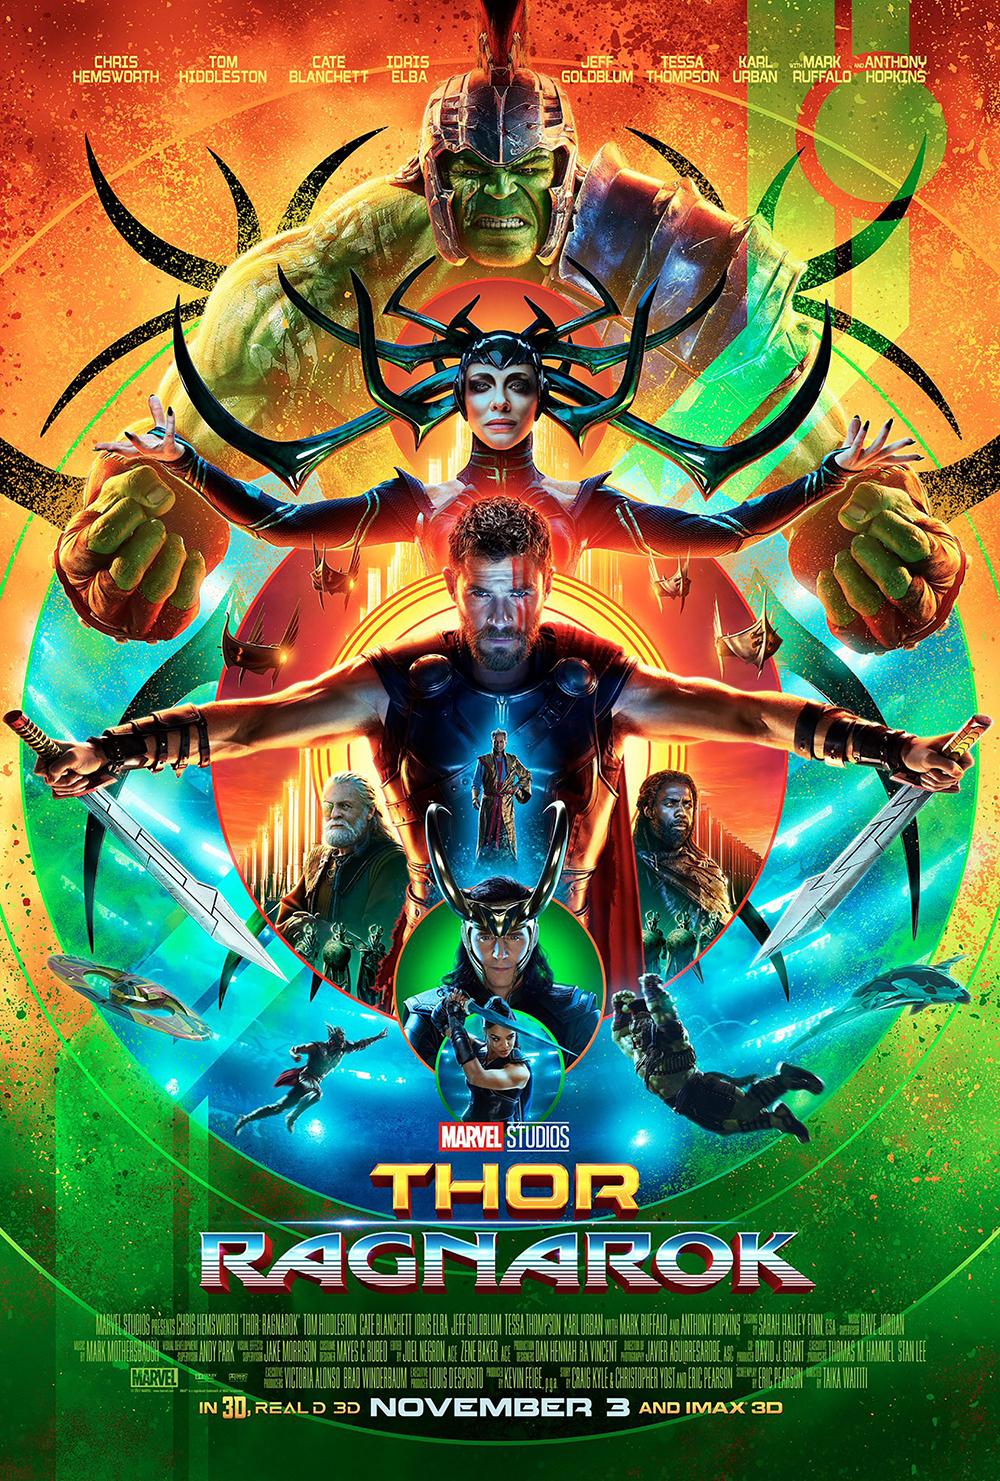 Thor: Ragnarok @ Image Engine